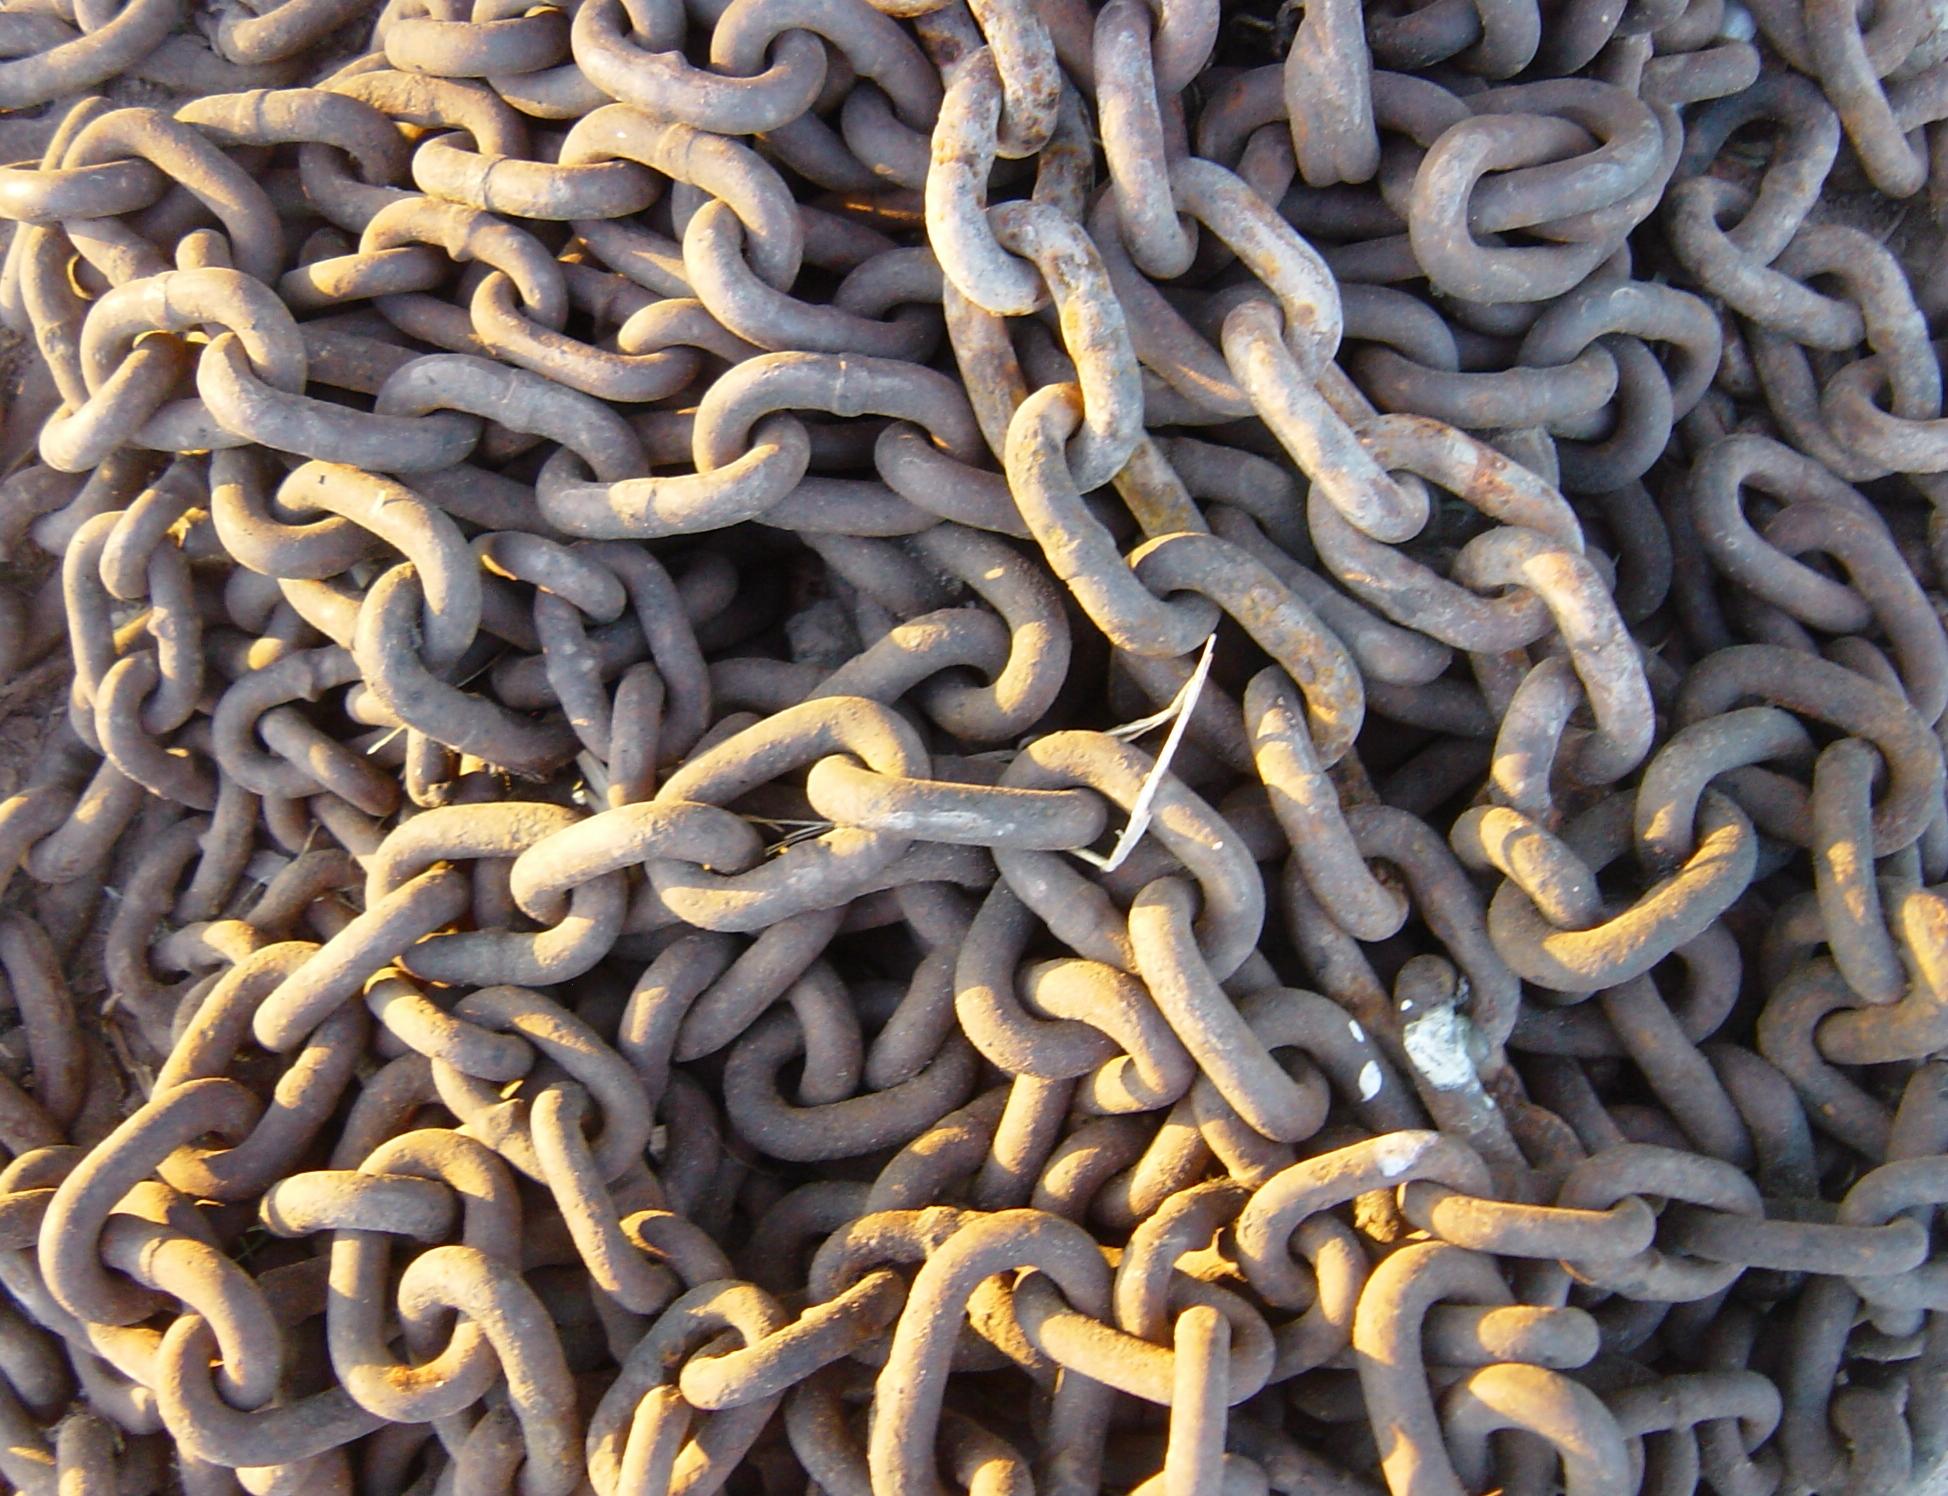 Rusty Metallic Chain Texture